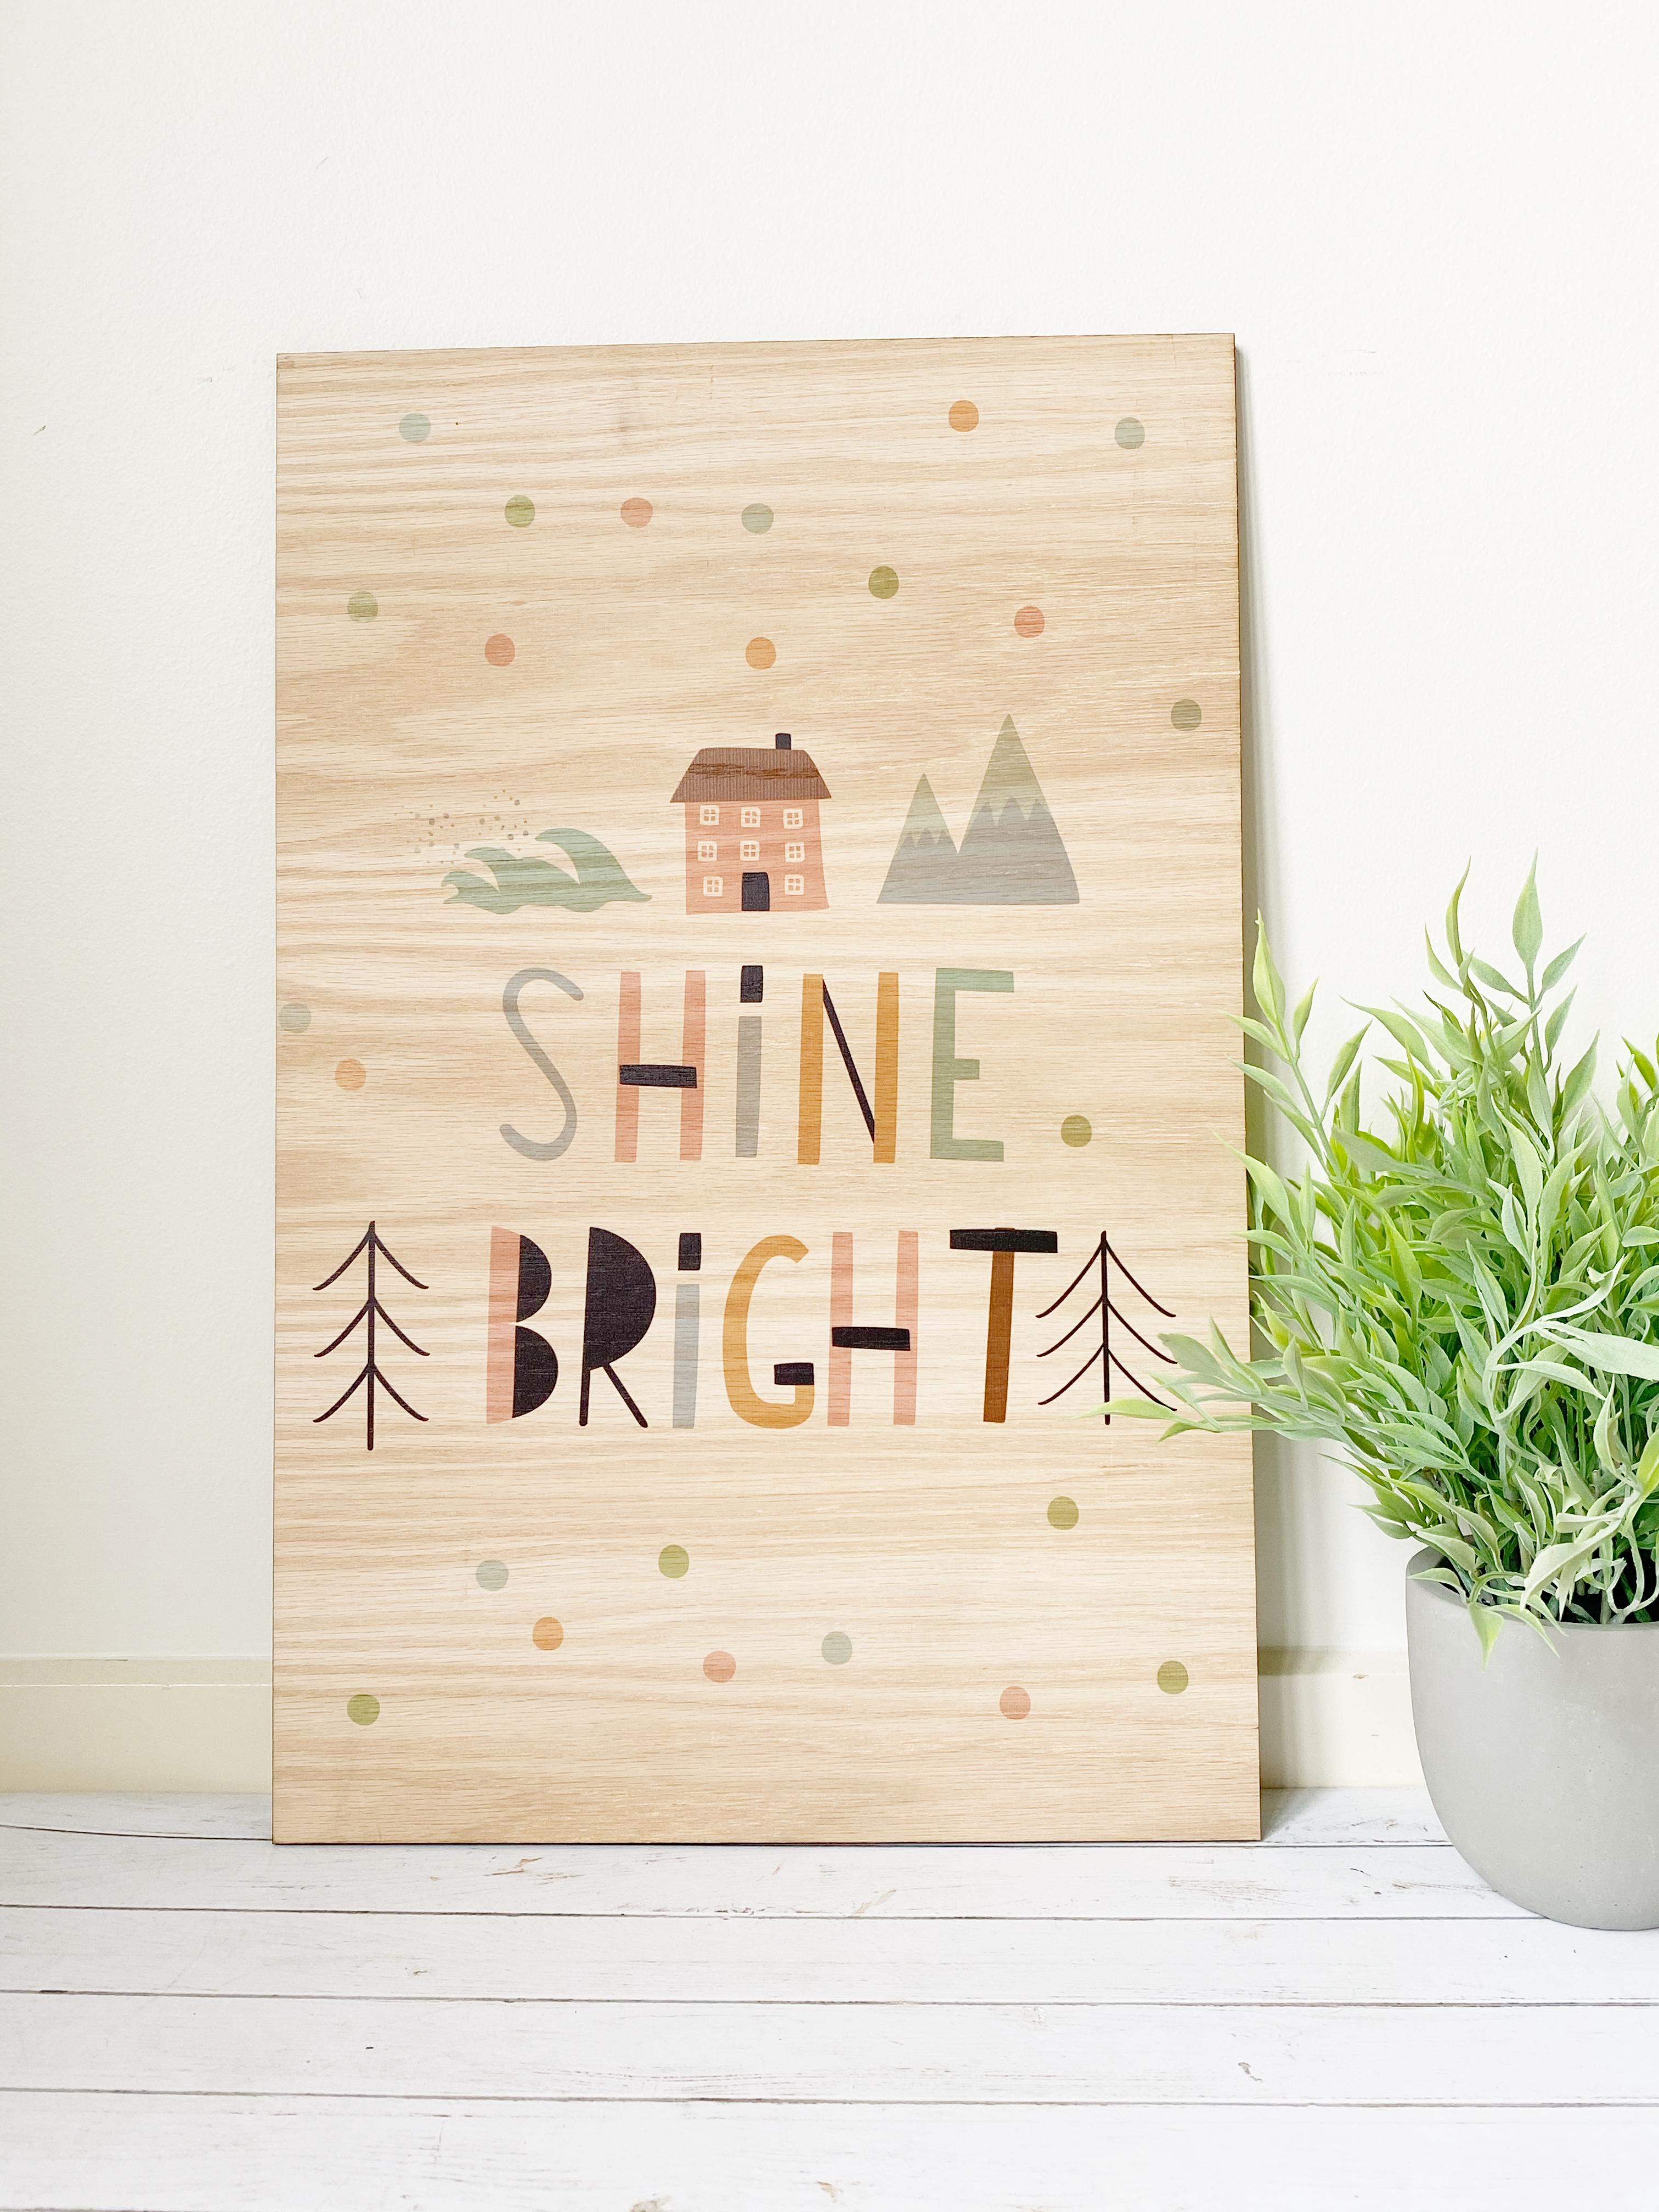 Shine Bright Wood Wall hanging